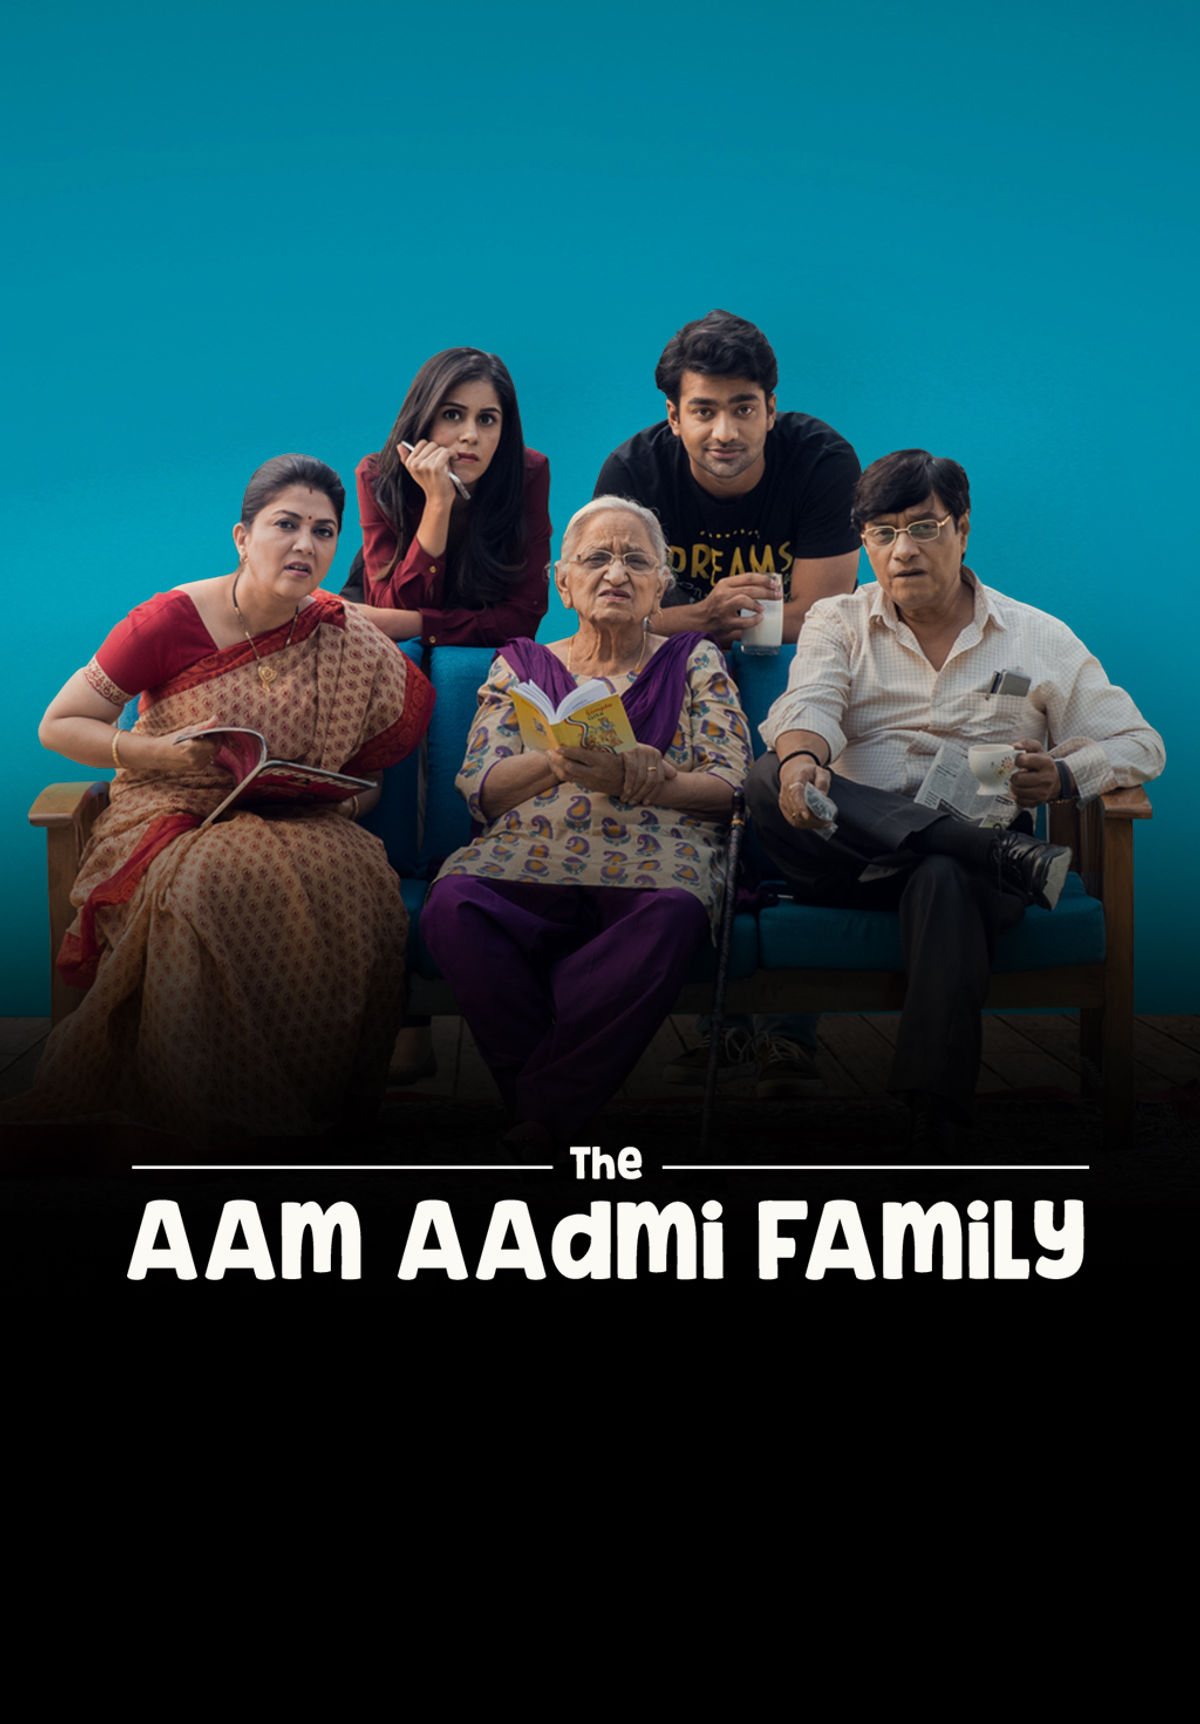 The Aam Aadmi Family